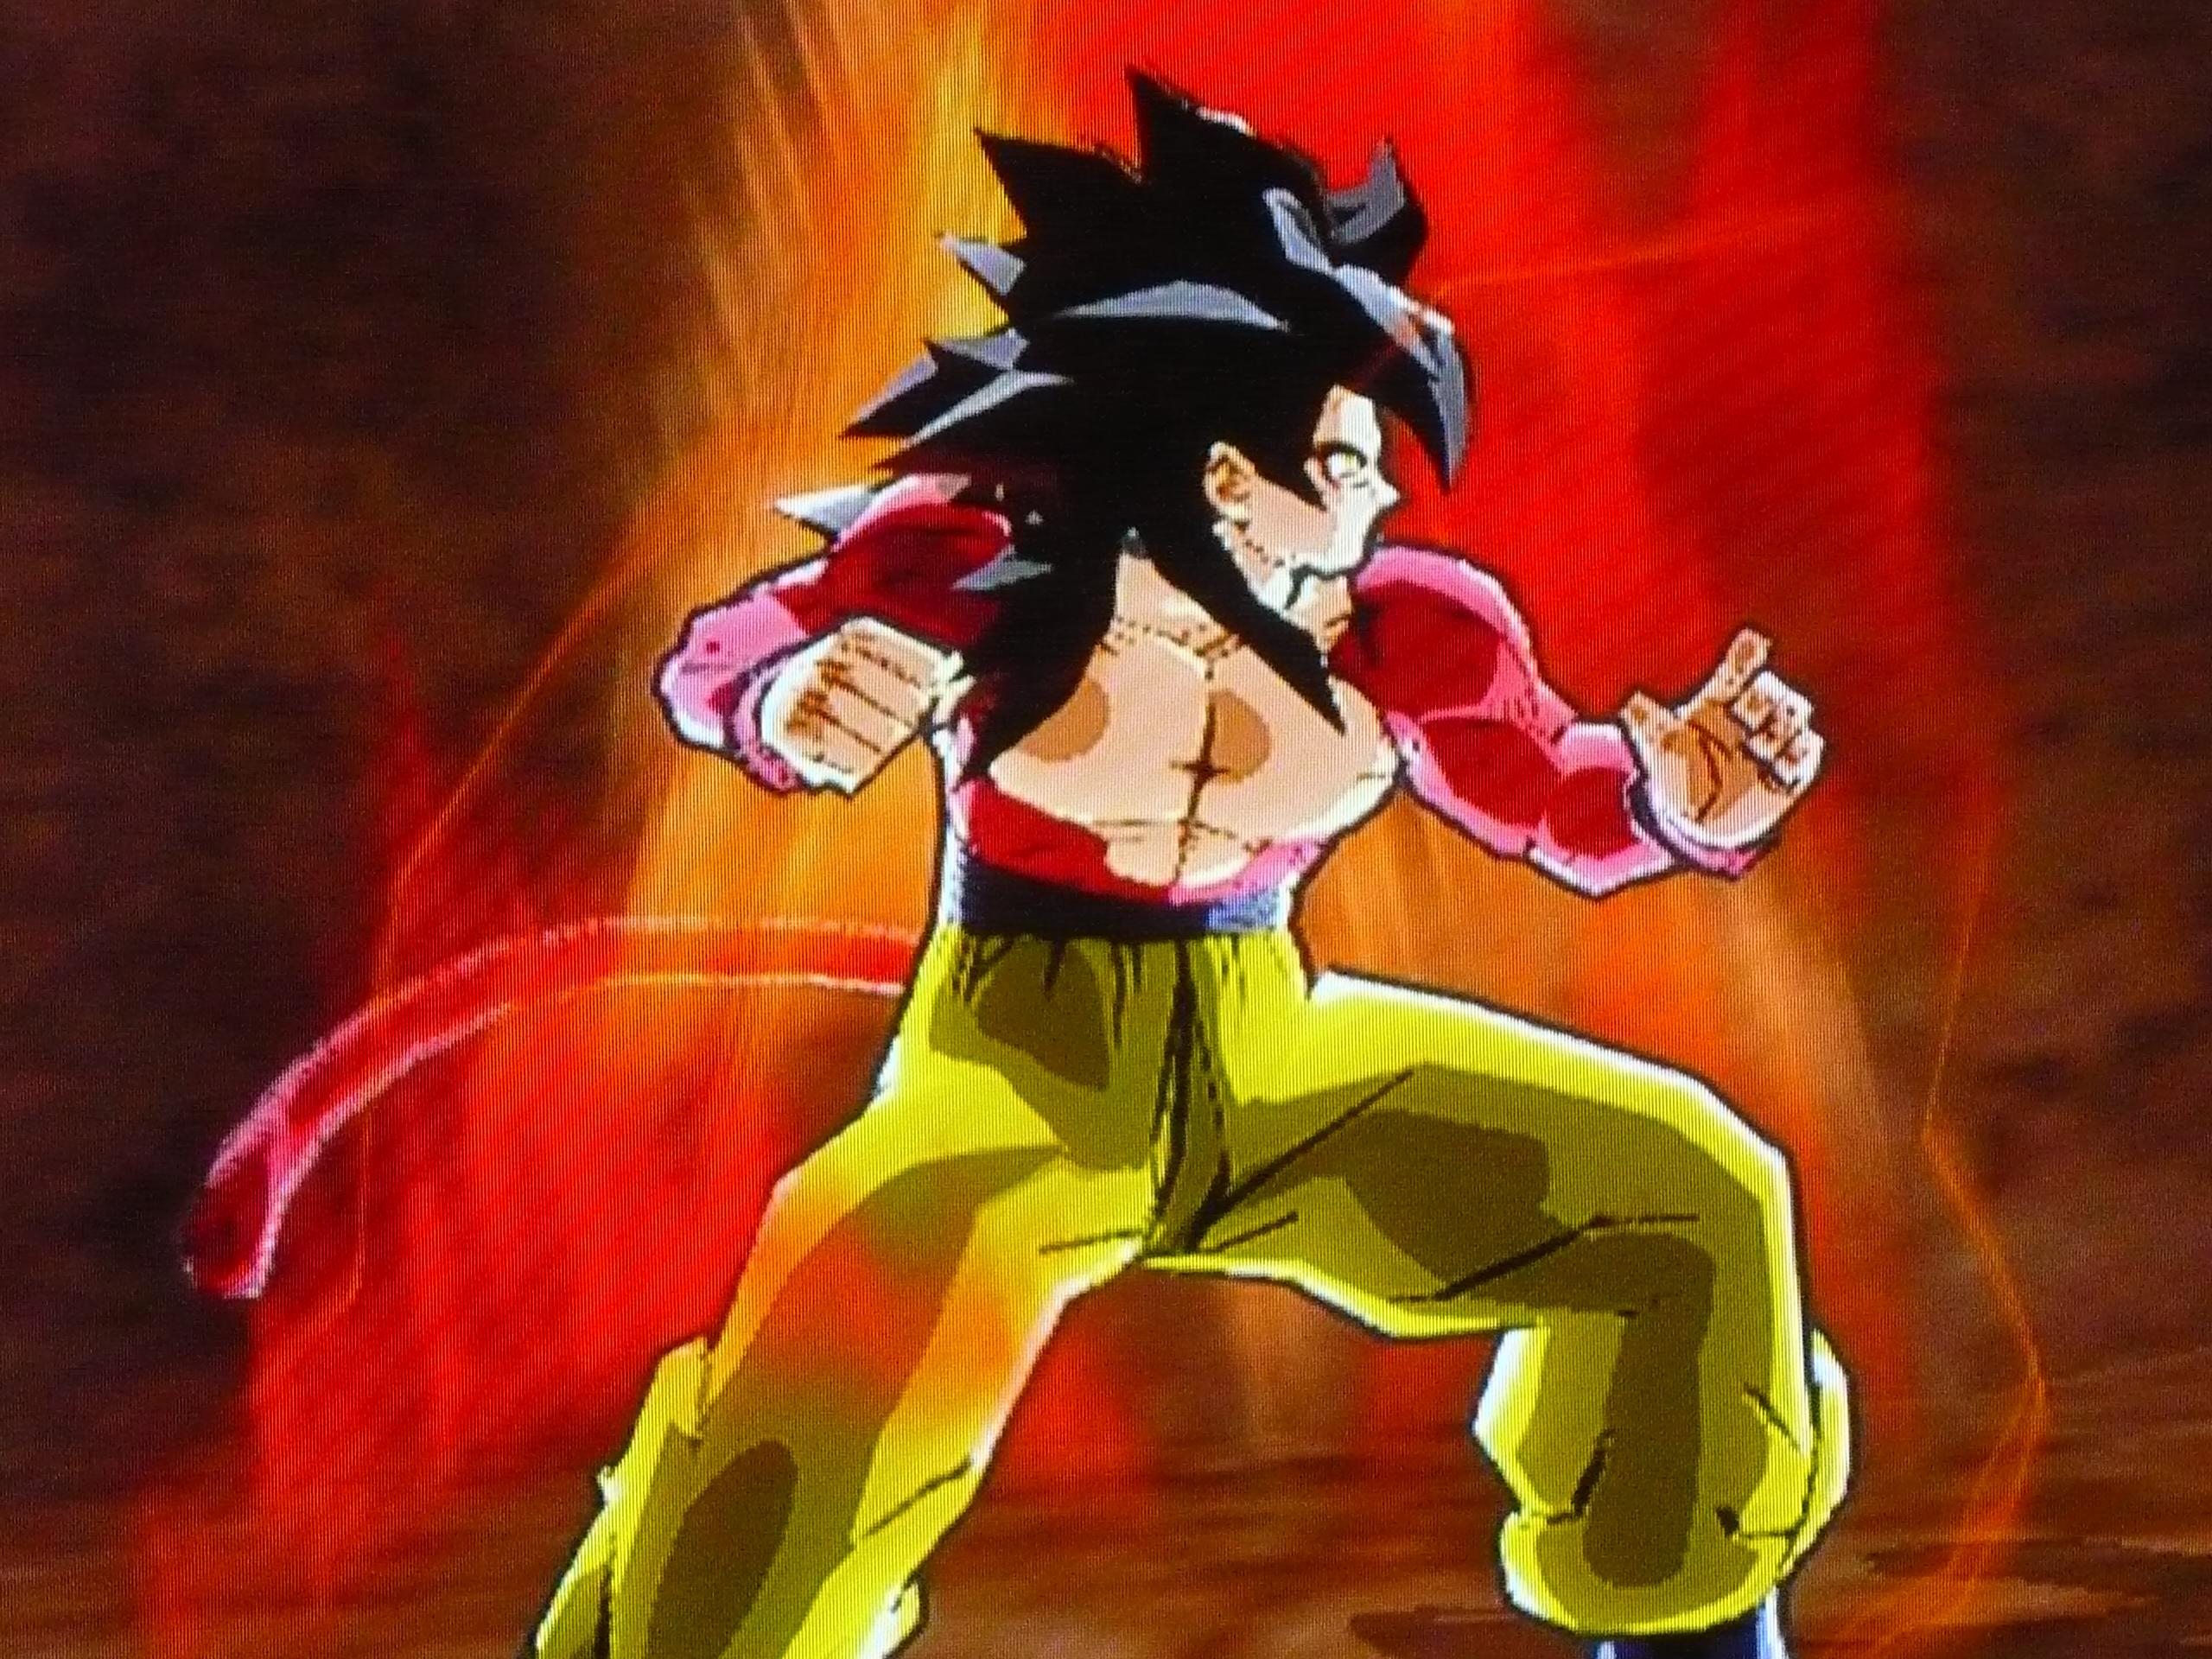 Goku ssj 4 vs kid buu dragon ball wiki fandom powered by wikia goku ssj 4 vs kid buu altavistaventures Images